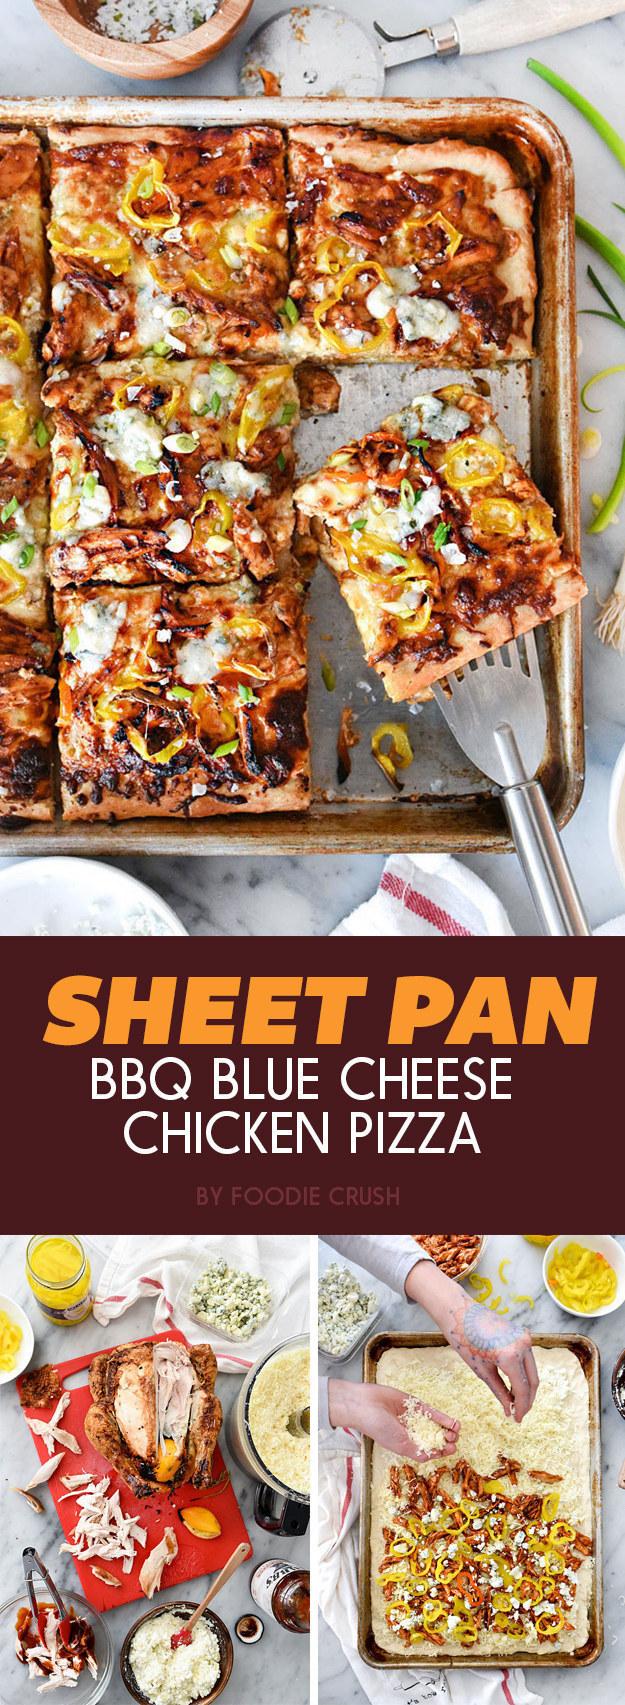 Sheet Pan BBQ Blue Cheese Chicken Pizza